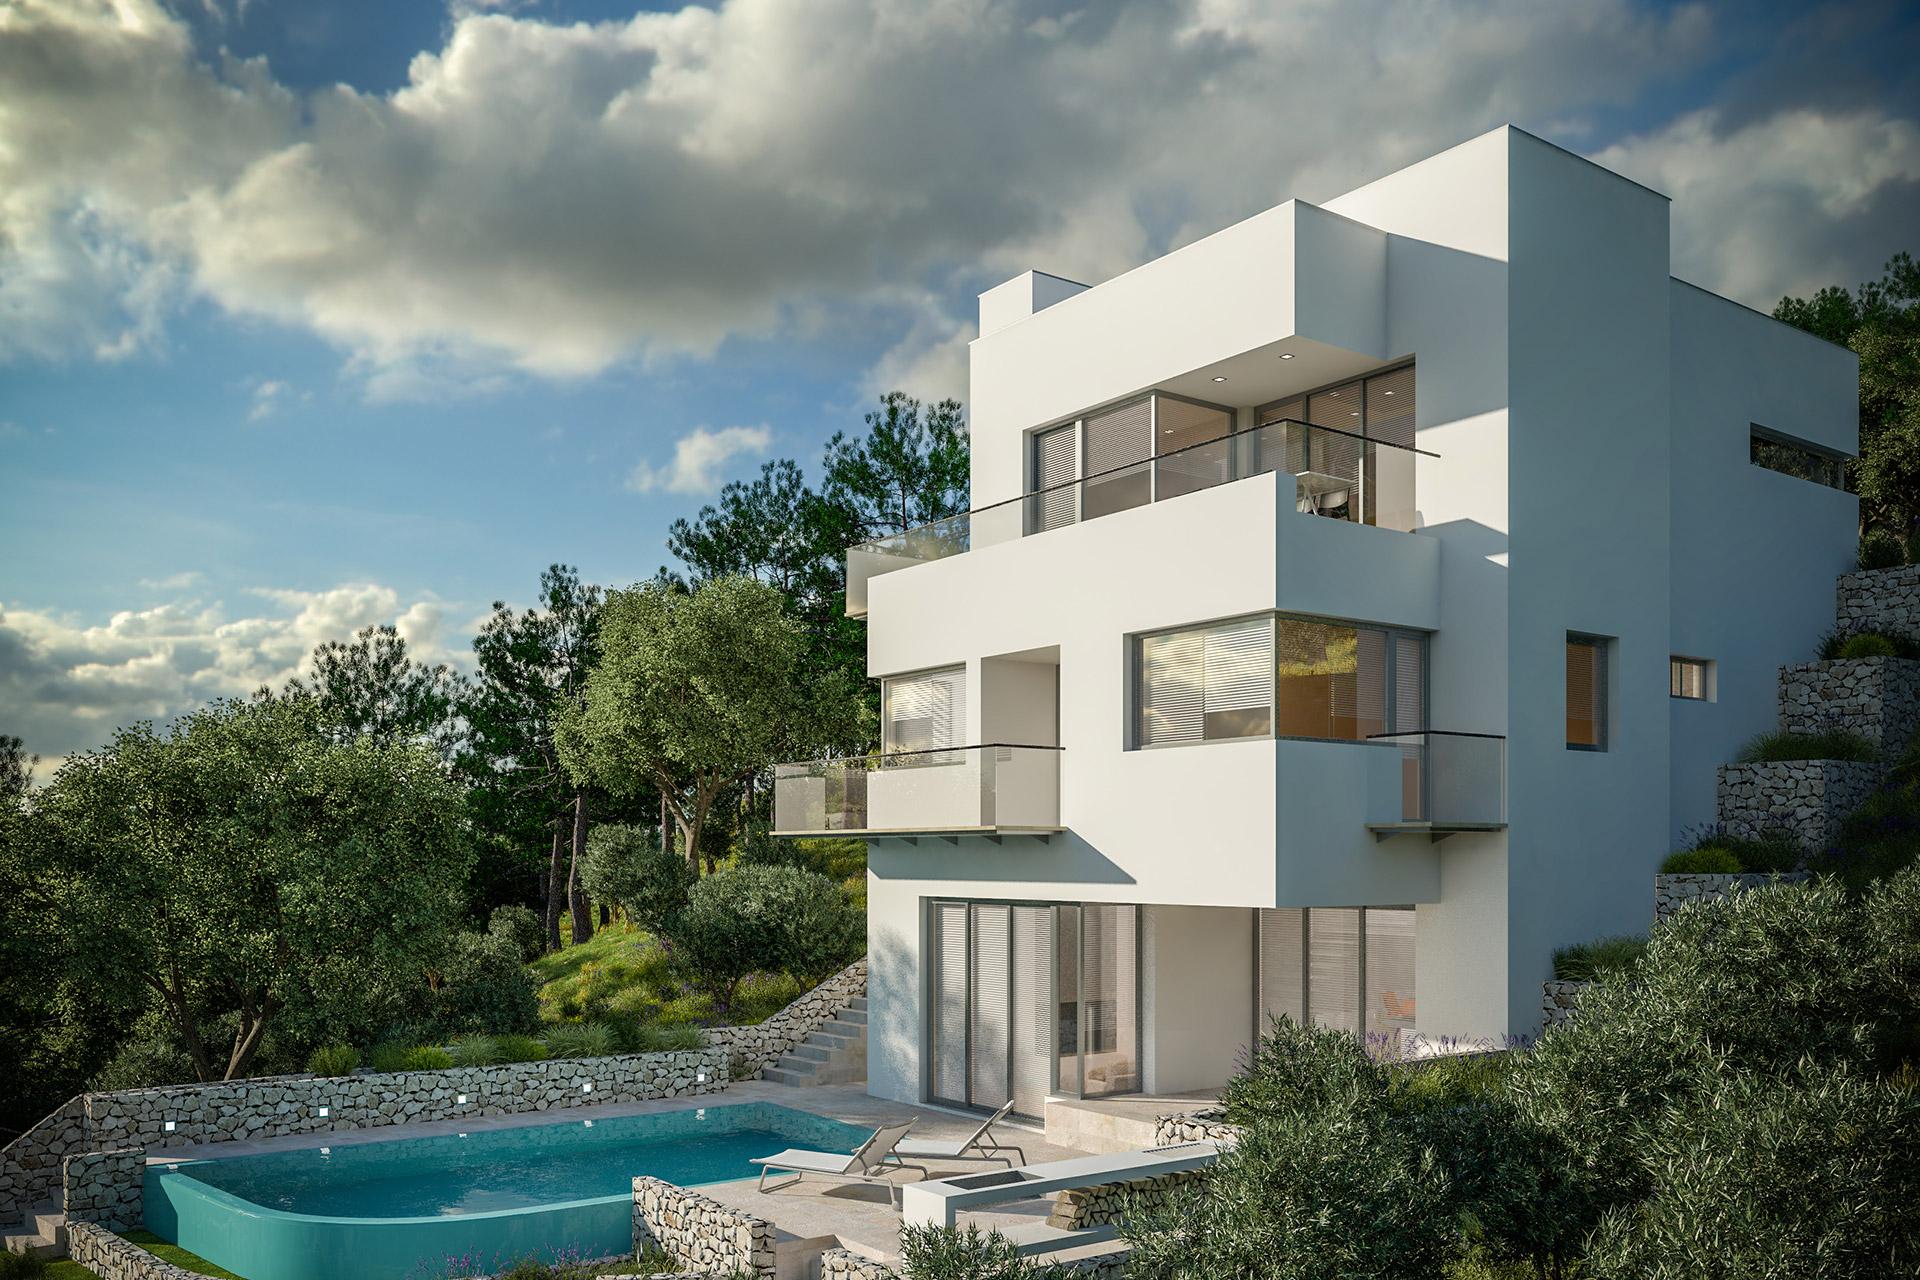 moderne villa am meer 1 reihe dream homes croatia. Black Bedroom Furniture Sets. Home Design Ideas